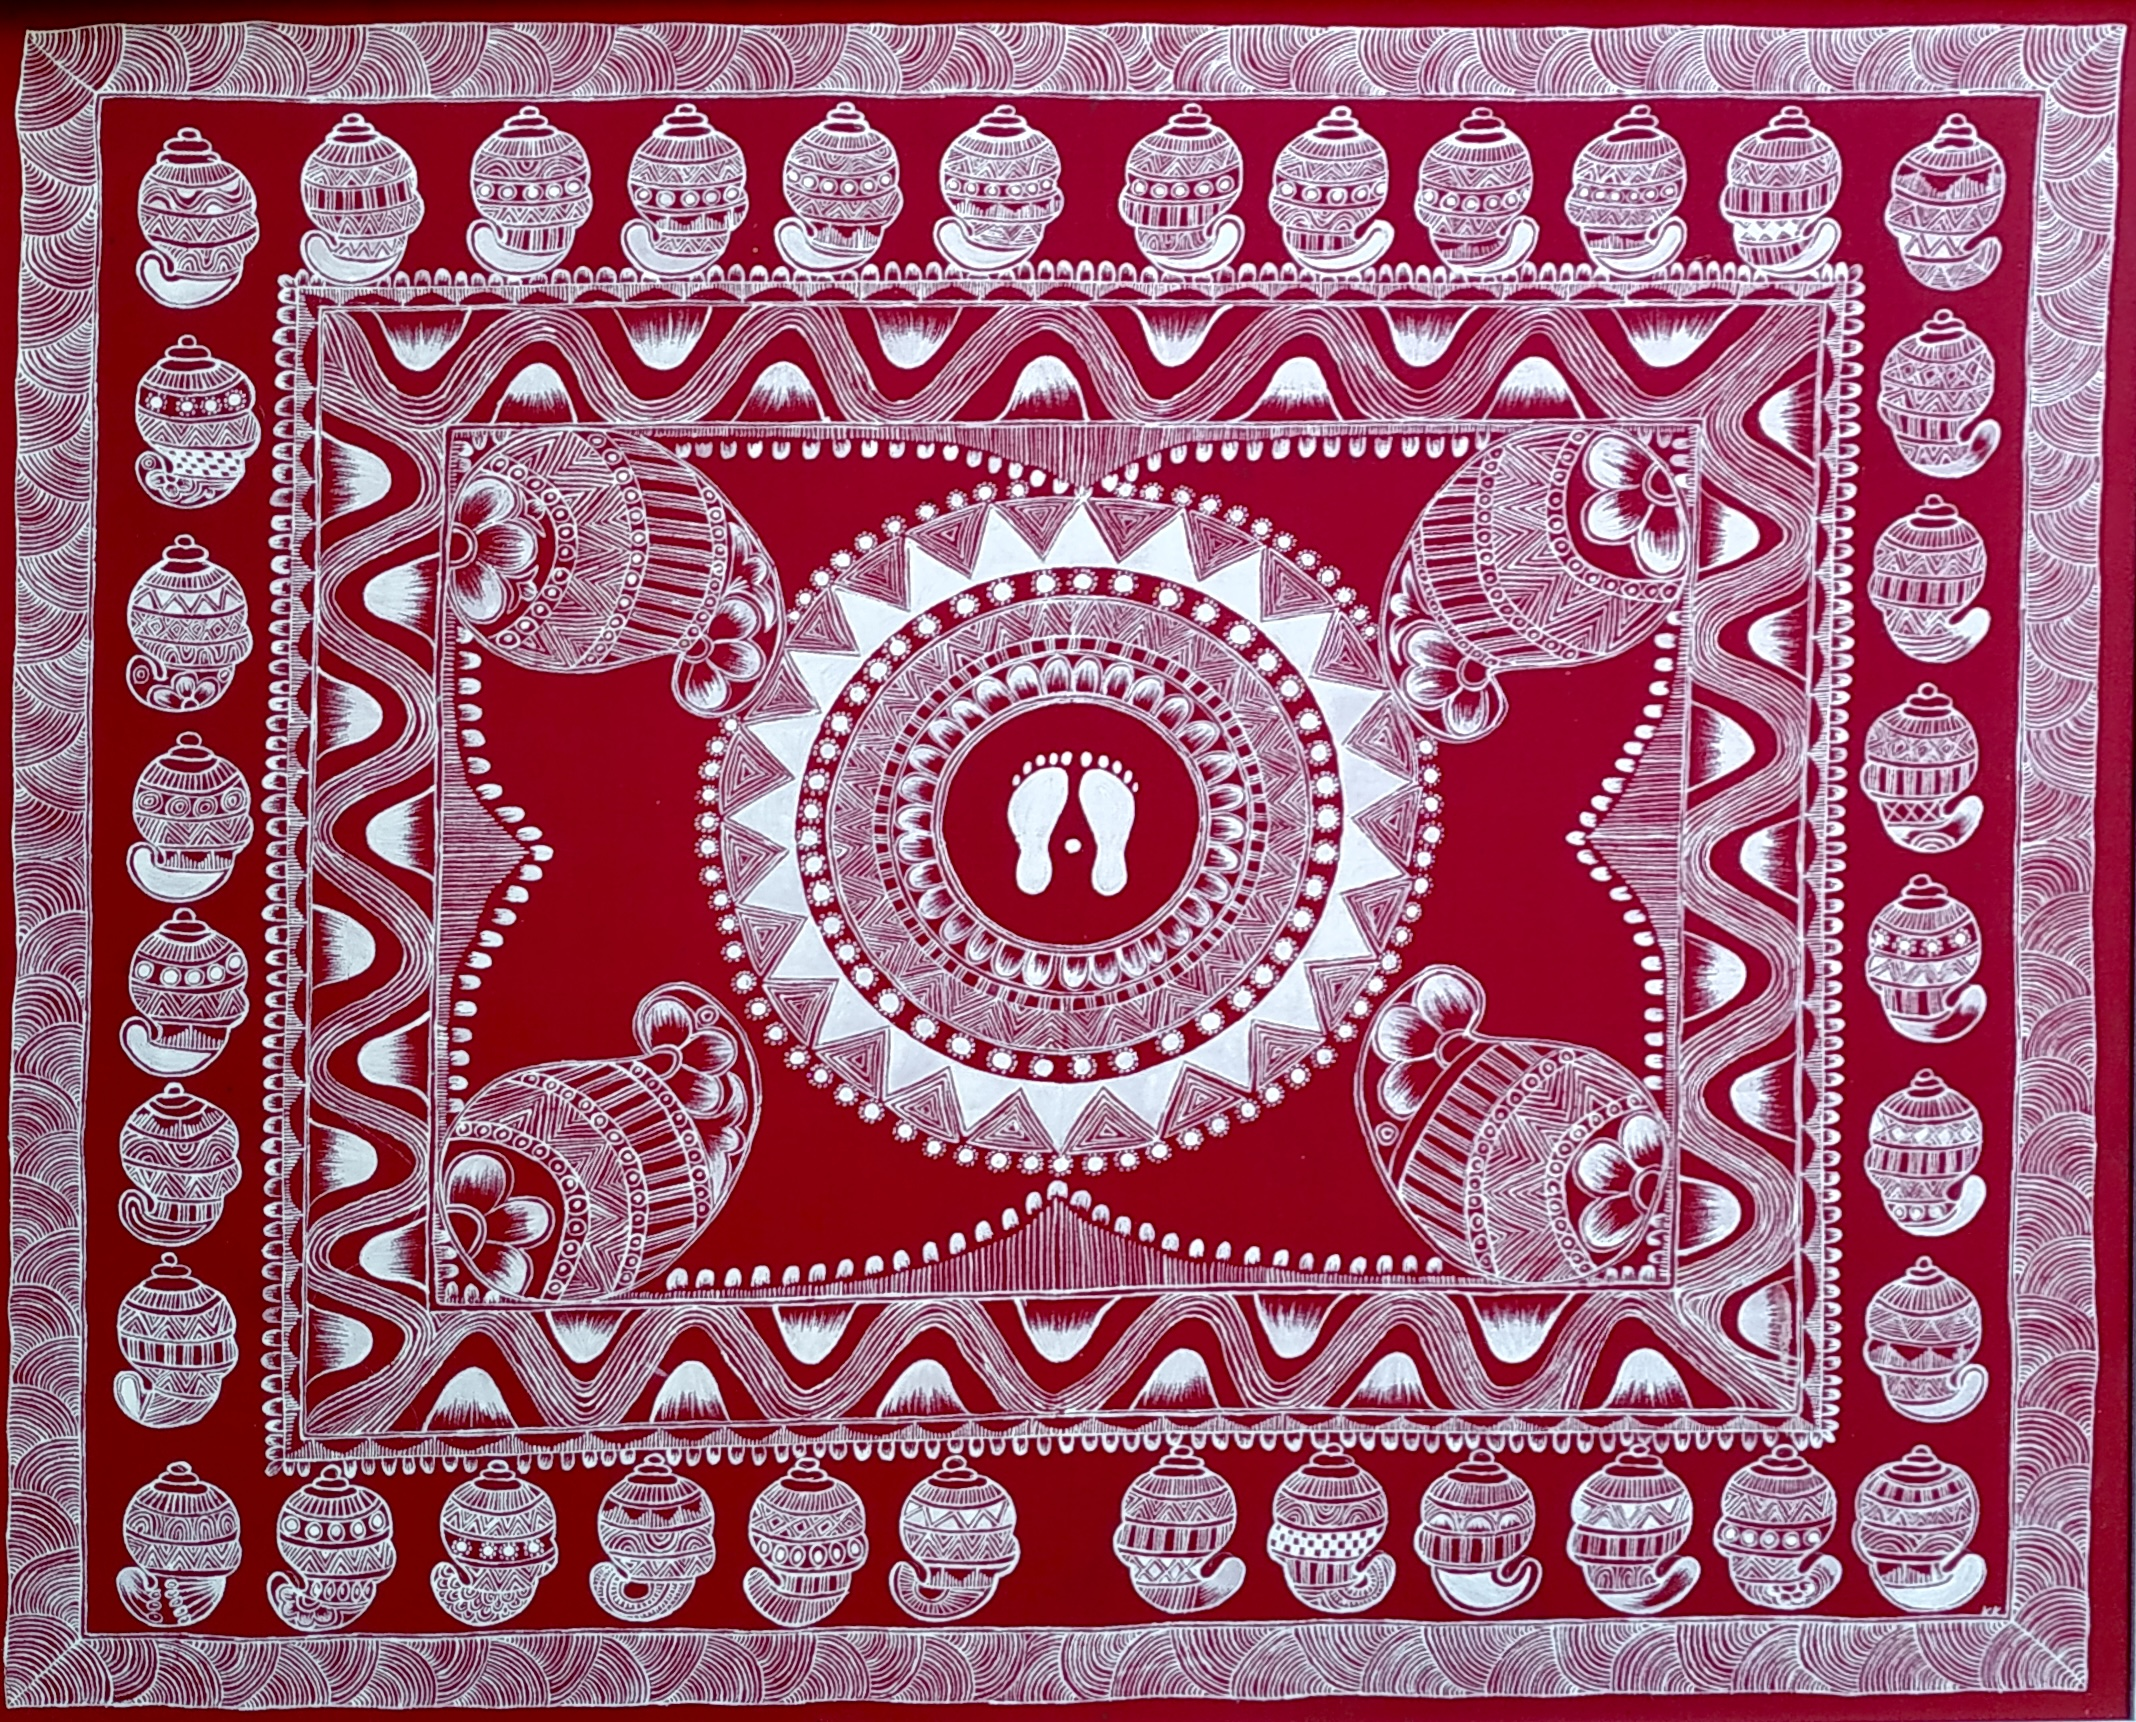 Laxmi Chowki Aipan Painting - Aipan Art